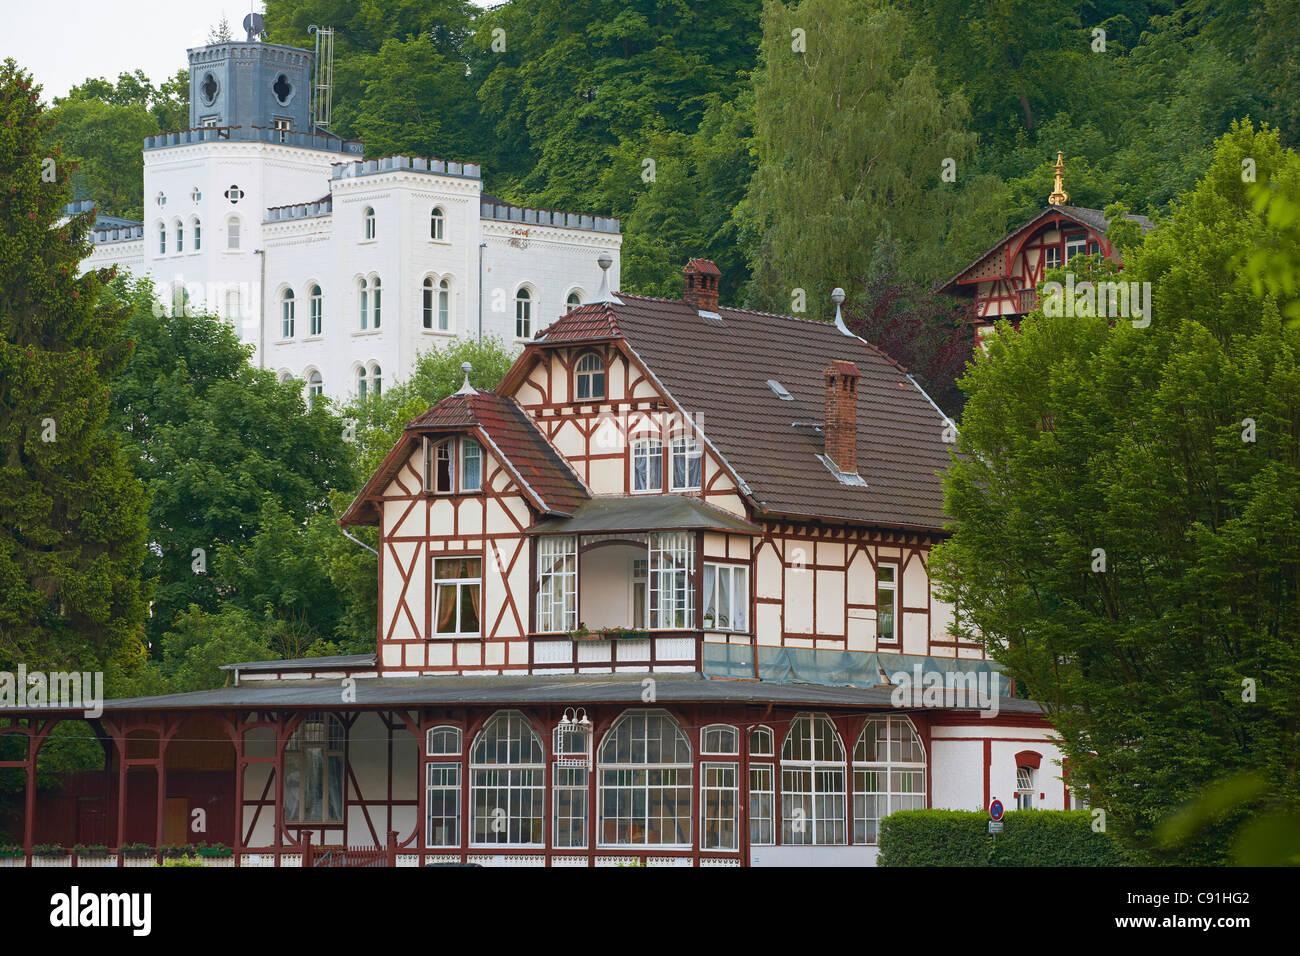 House of art, Balmoral castle, Half-timbered house, Bad Ems an der Lahn, Bad Ems on Lahn, Rhineland-Palatinate, - Stock Image